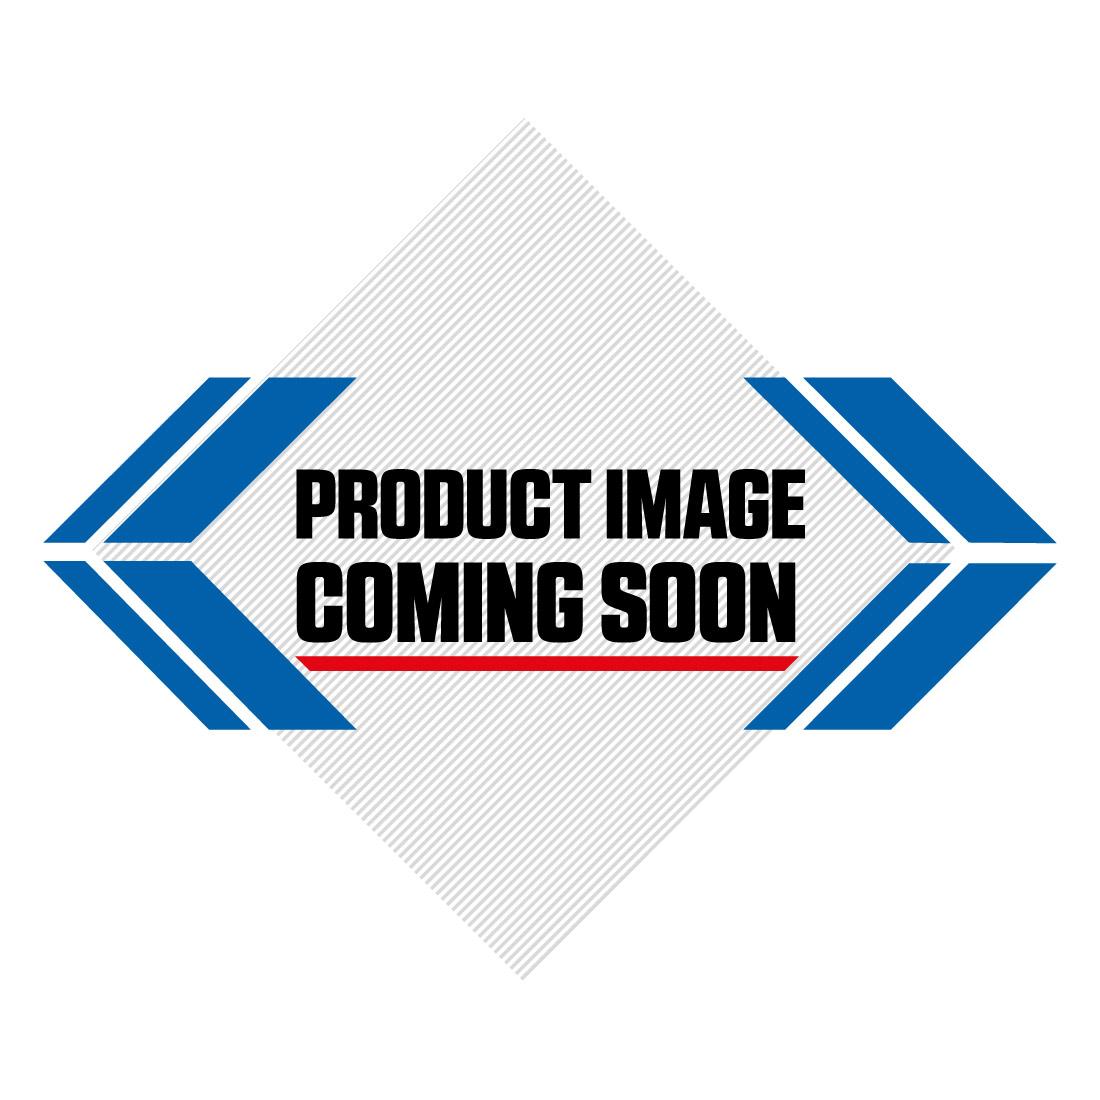 UFO KTM Plastic Kit SX 125 150 250 SXF 250 350 450 (16-18) OEM 17 Image-5>